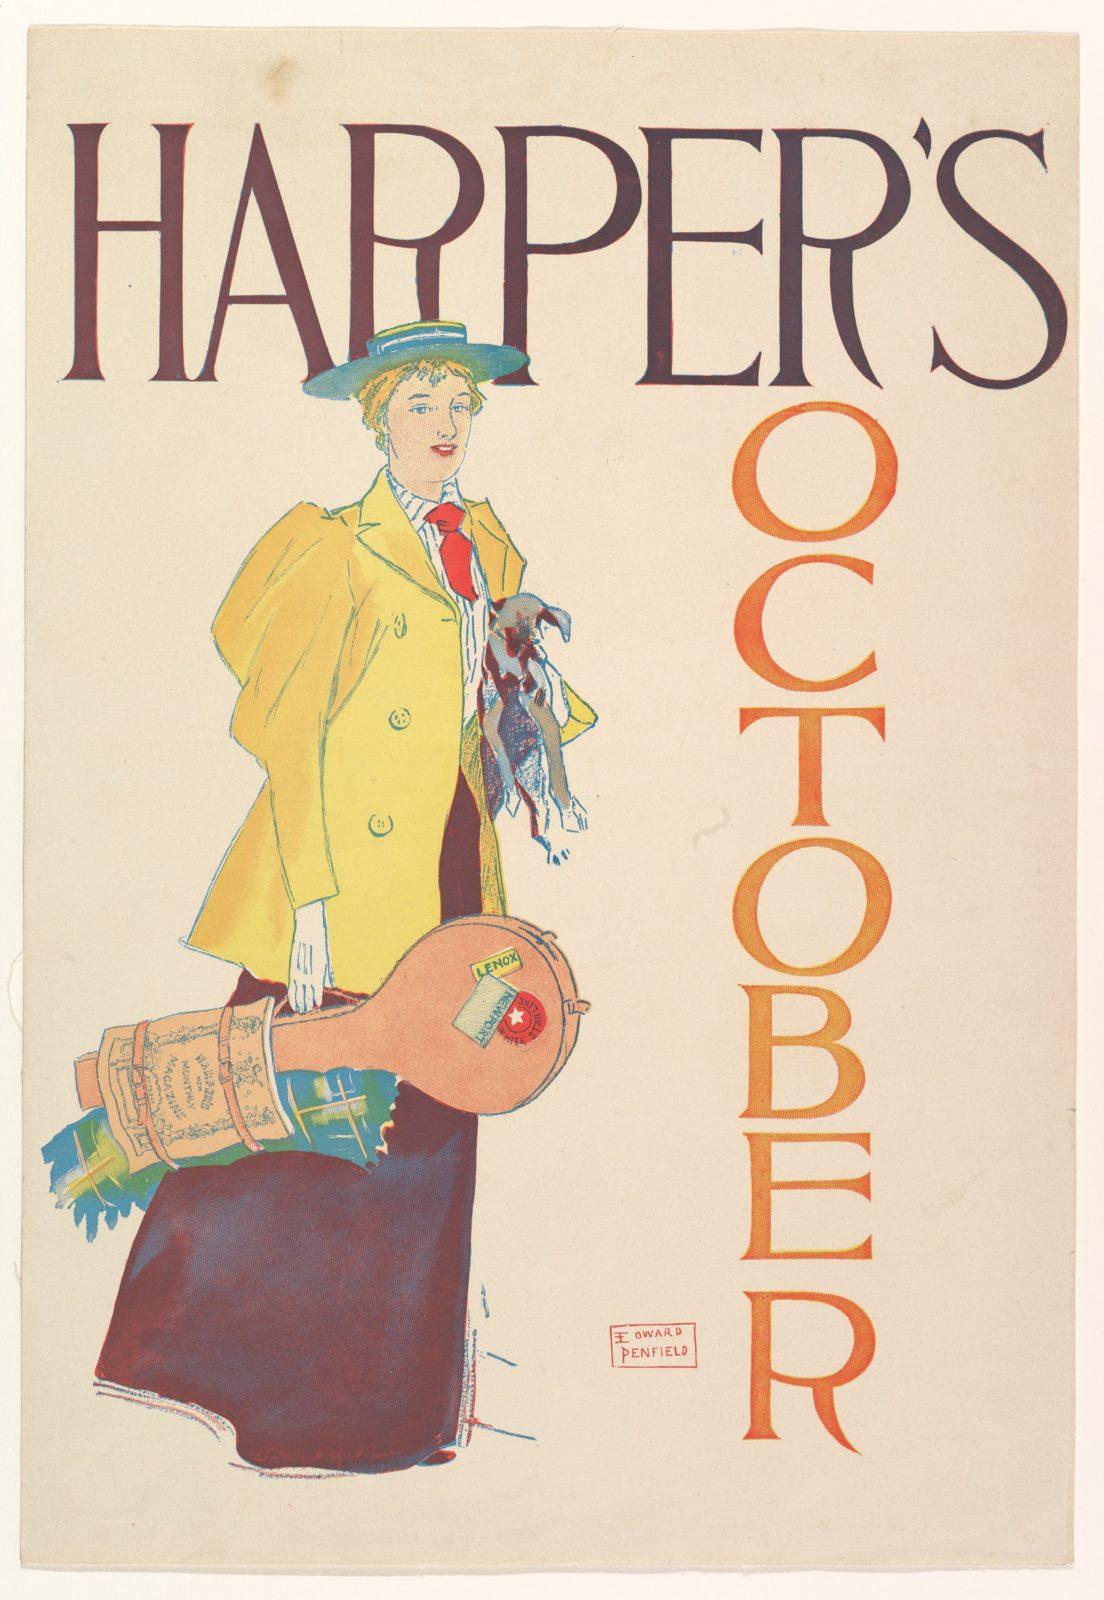 Harper's, October